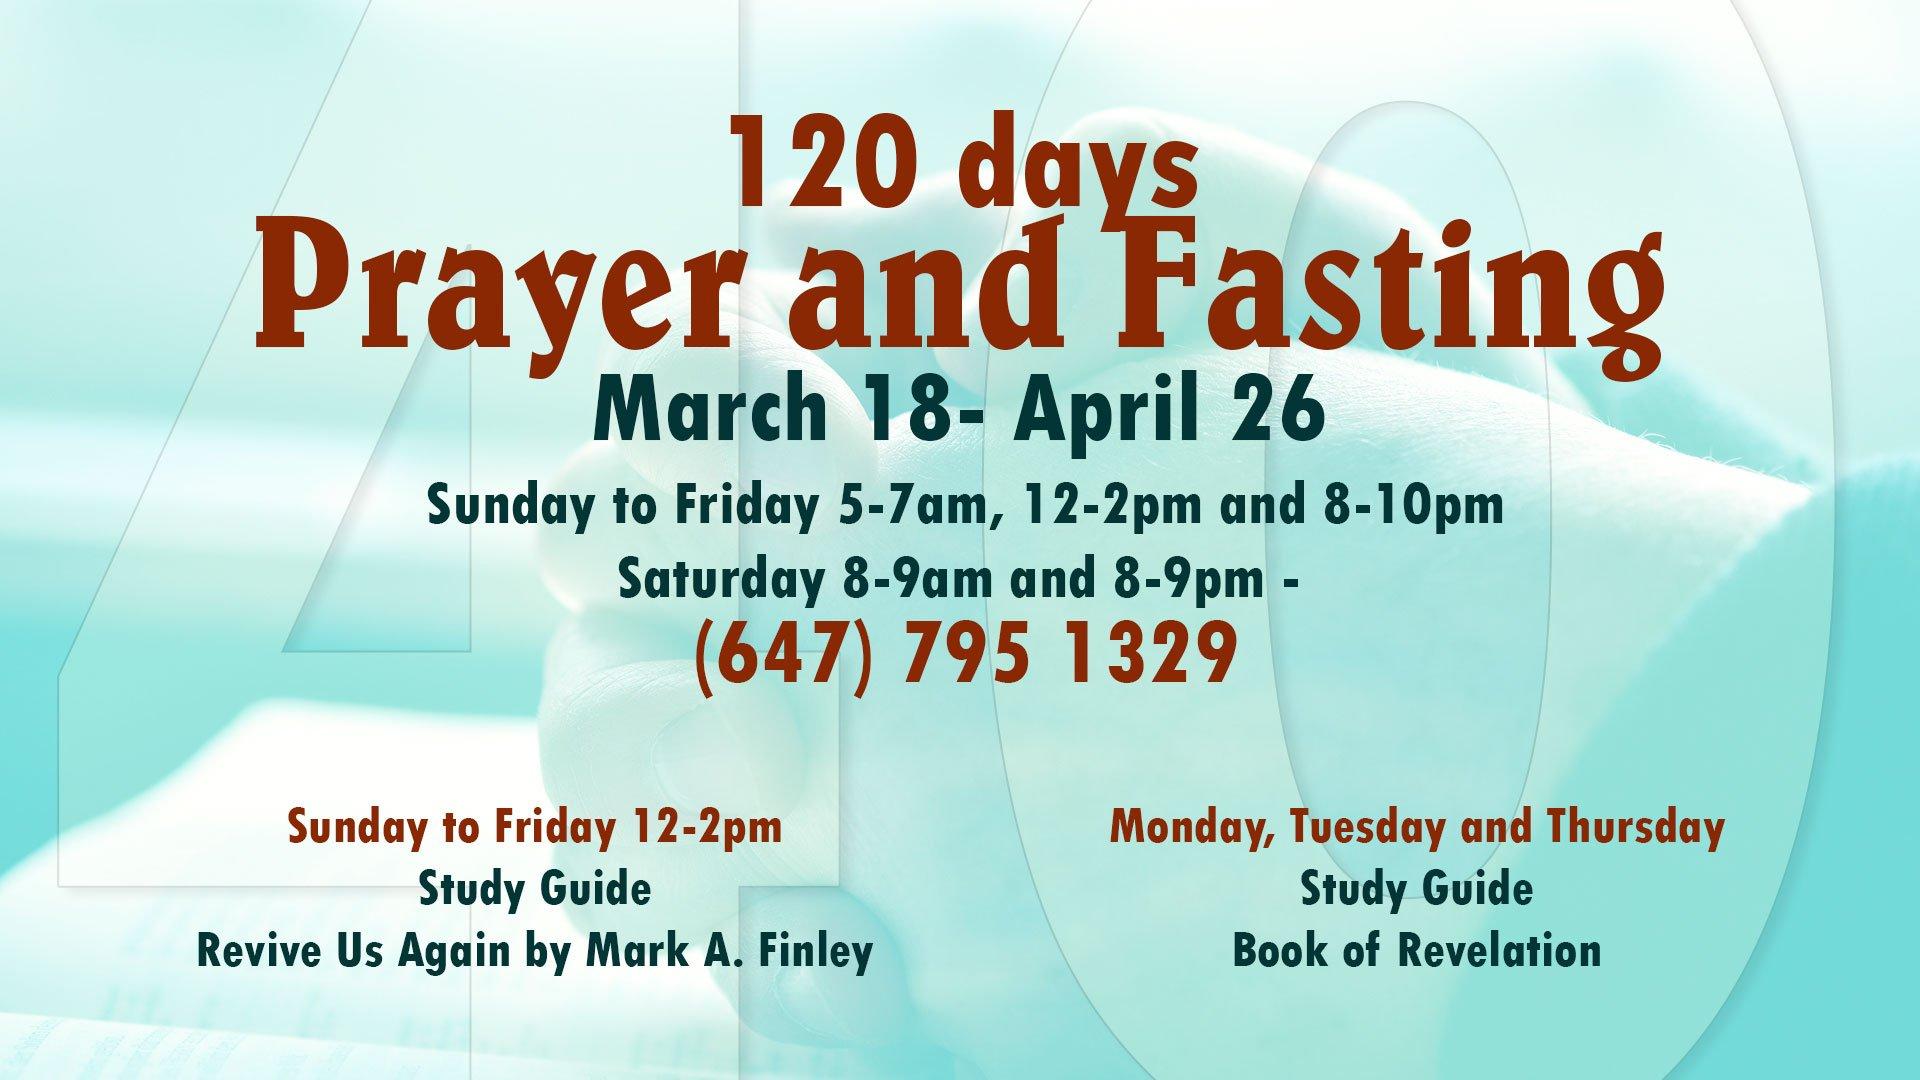 120 days of Prayer flyer